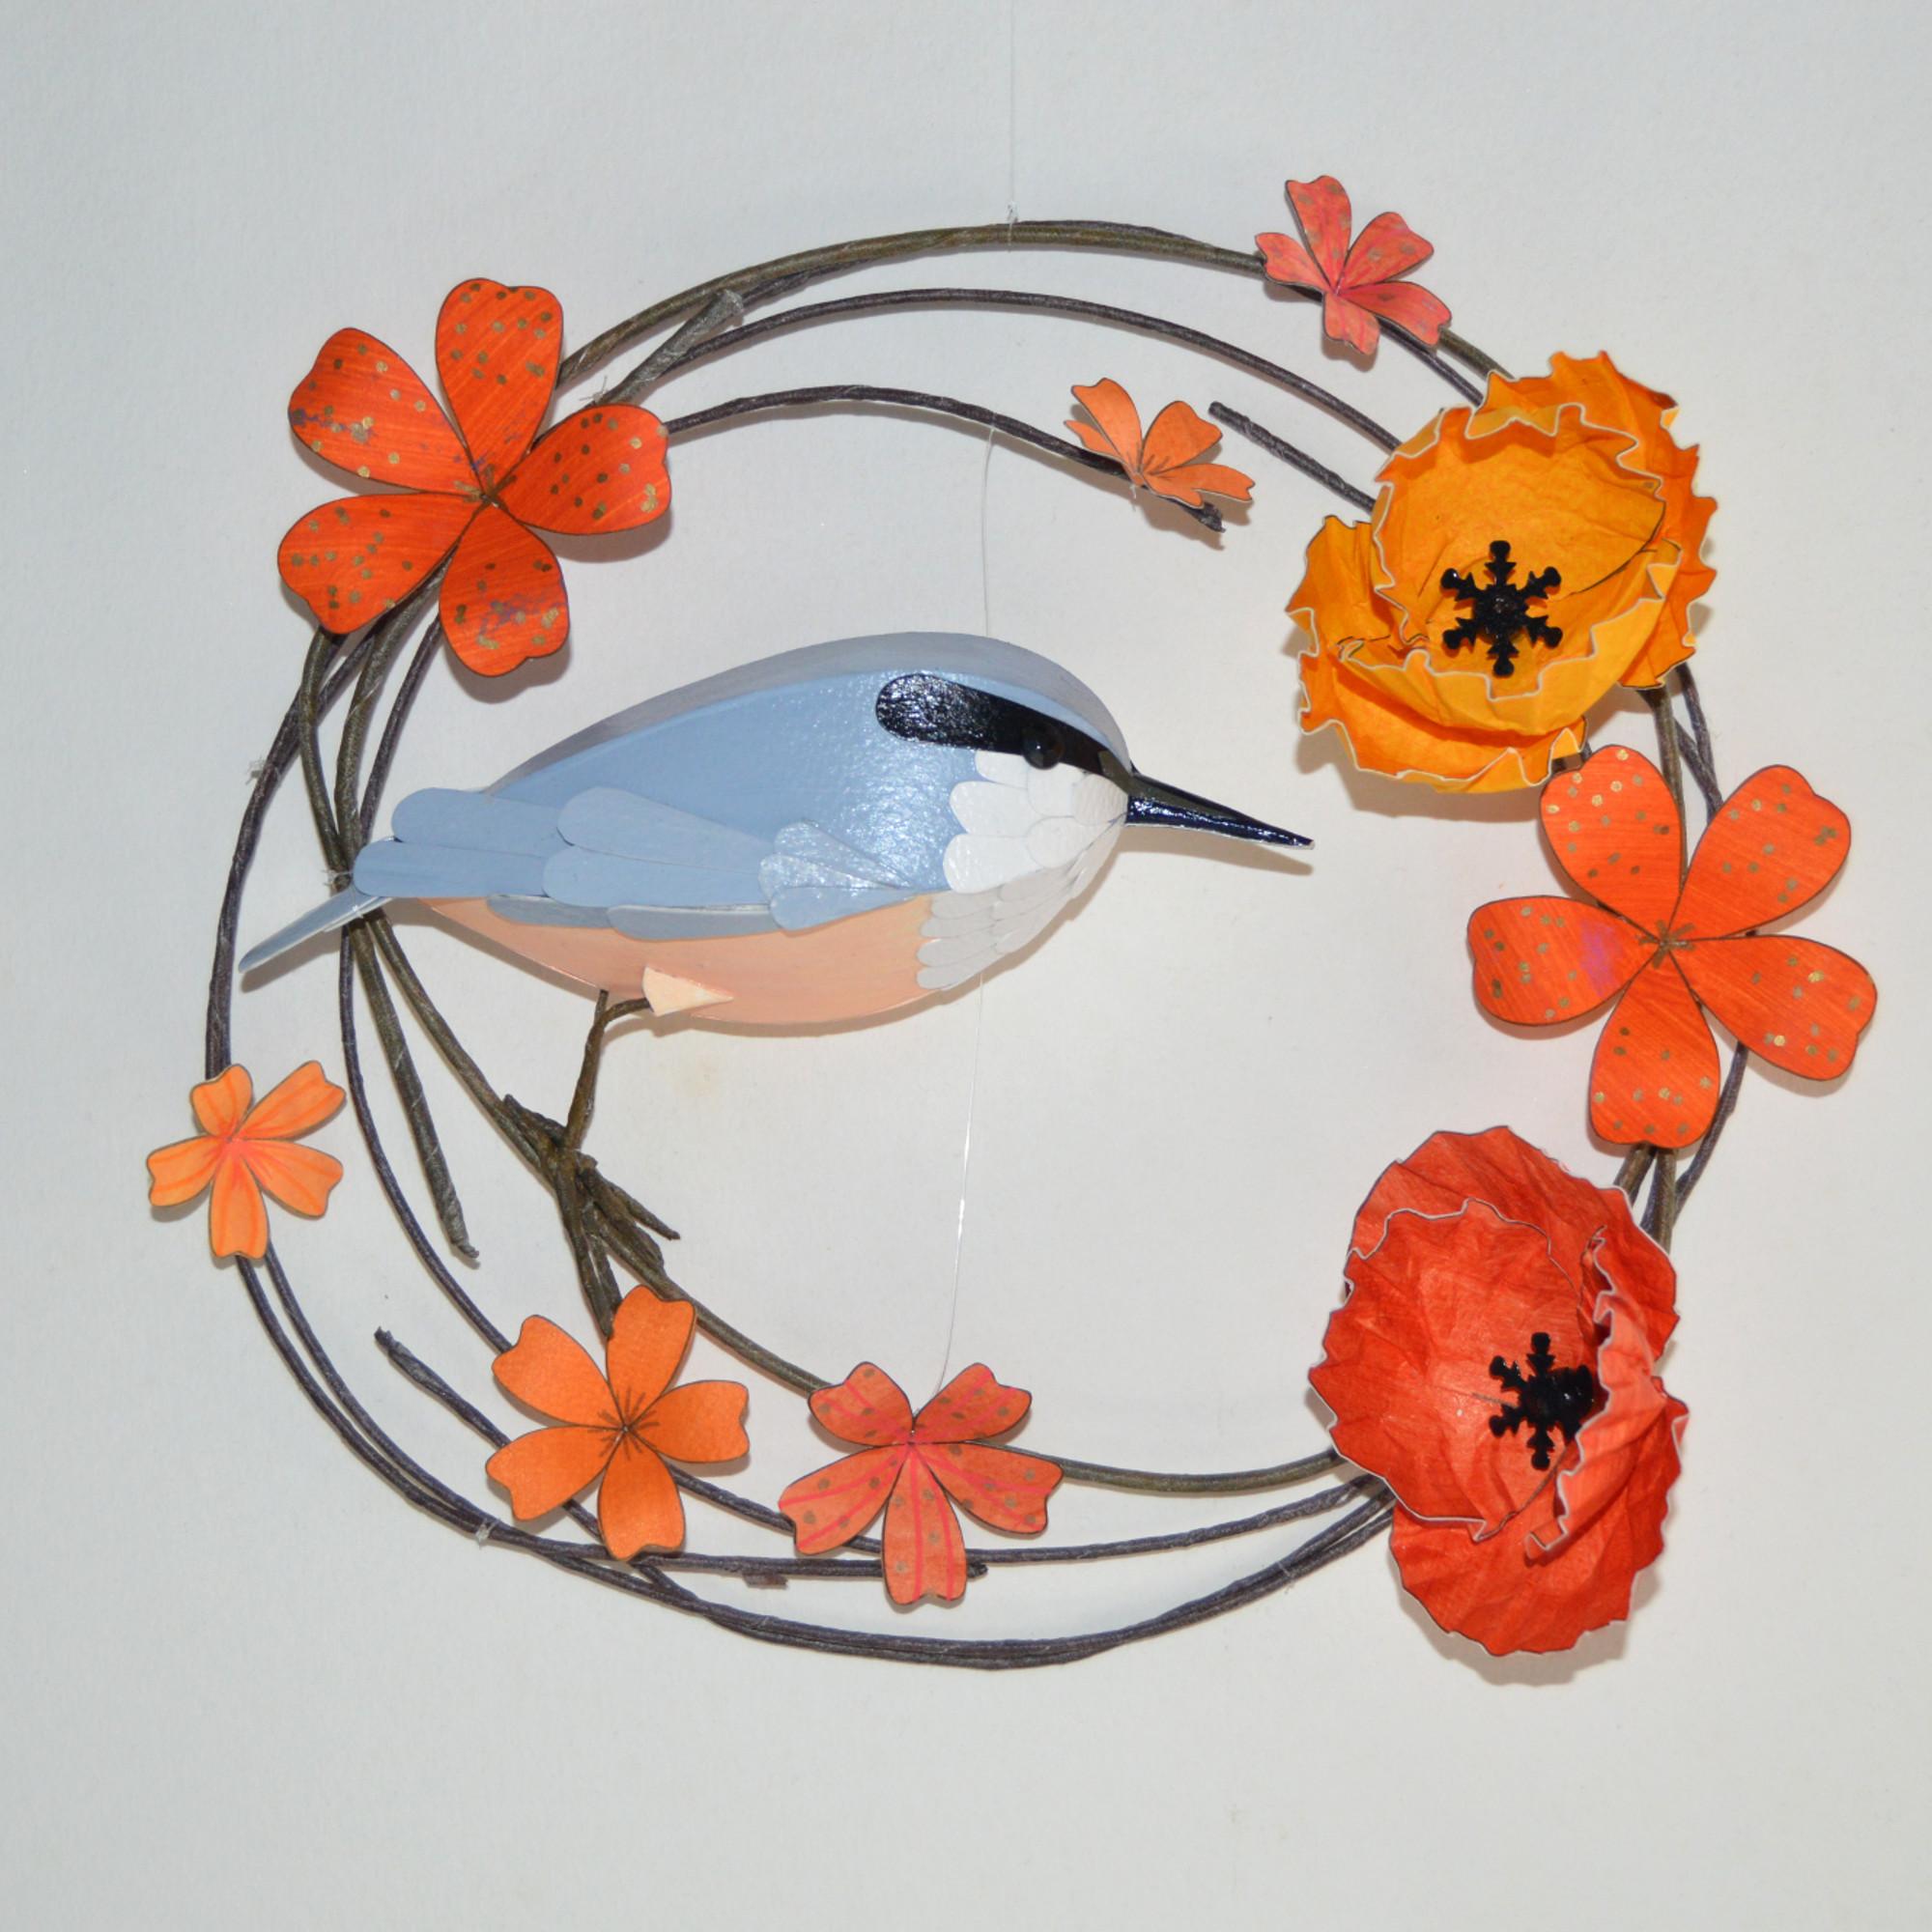 Stevie the nuthatch on a hoop of orange flowers